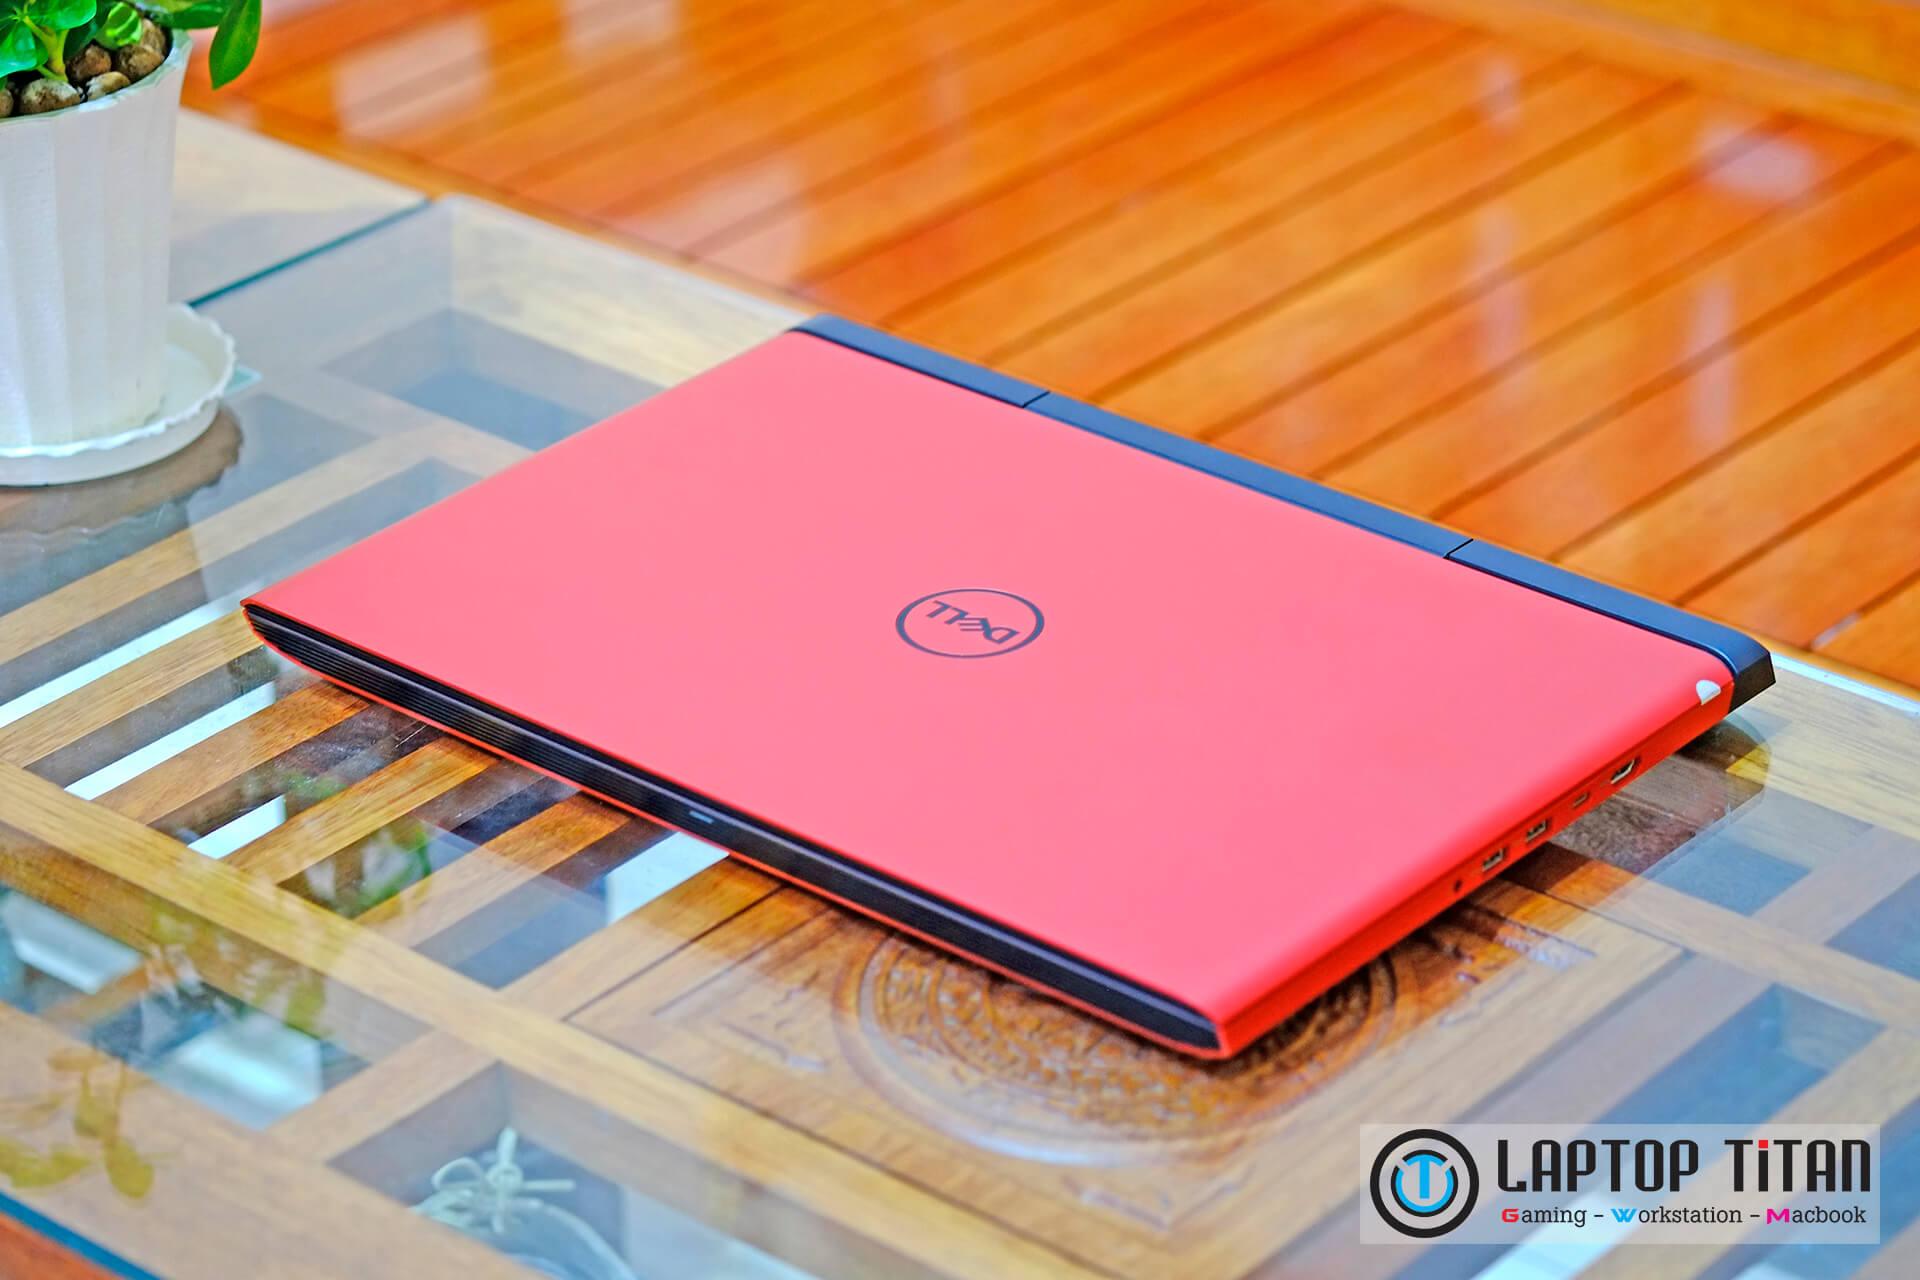 "Dell G5 5587 i7 8750H / 16GB / 128GB + 1TB / GTX 1050Ti 4GB / 15.6"" FHD / Likenew"